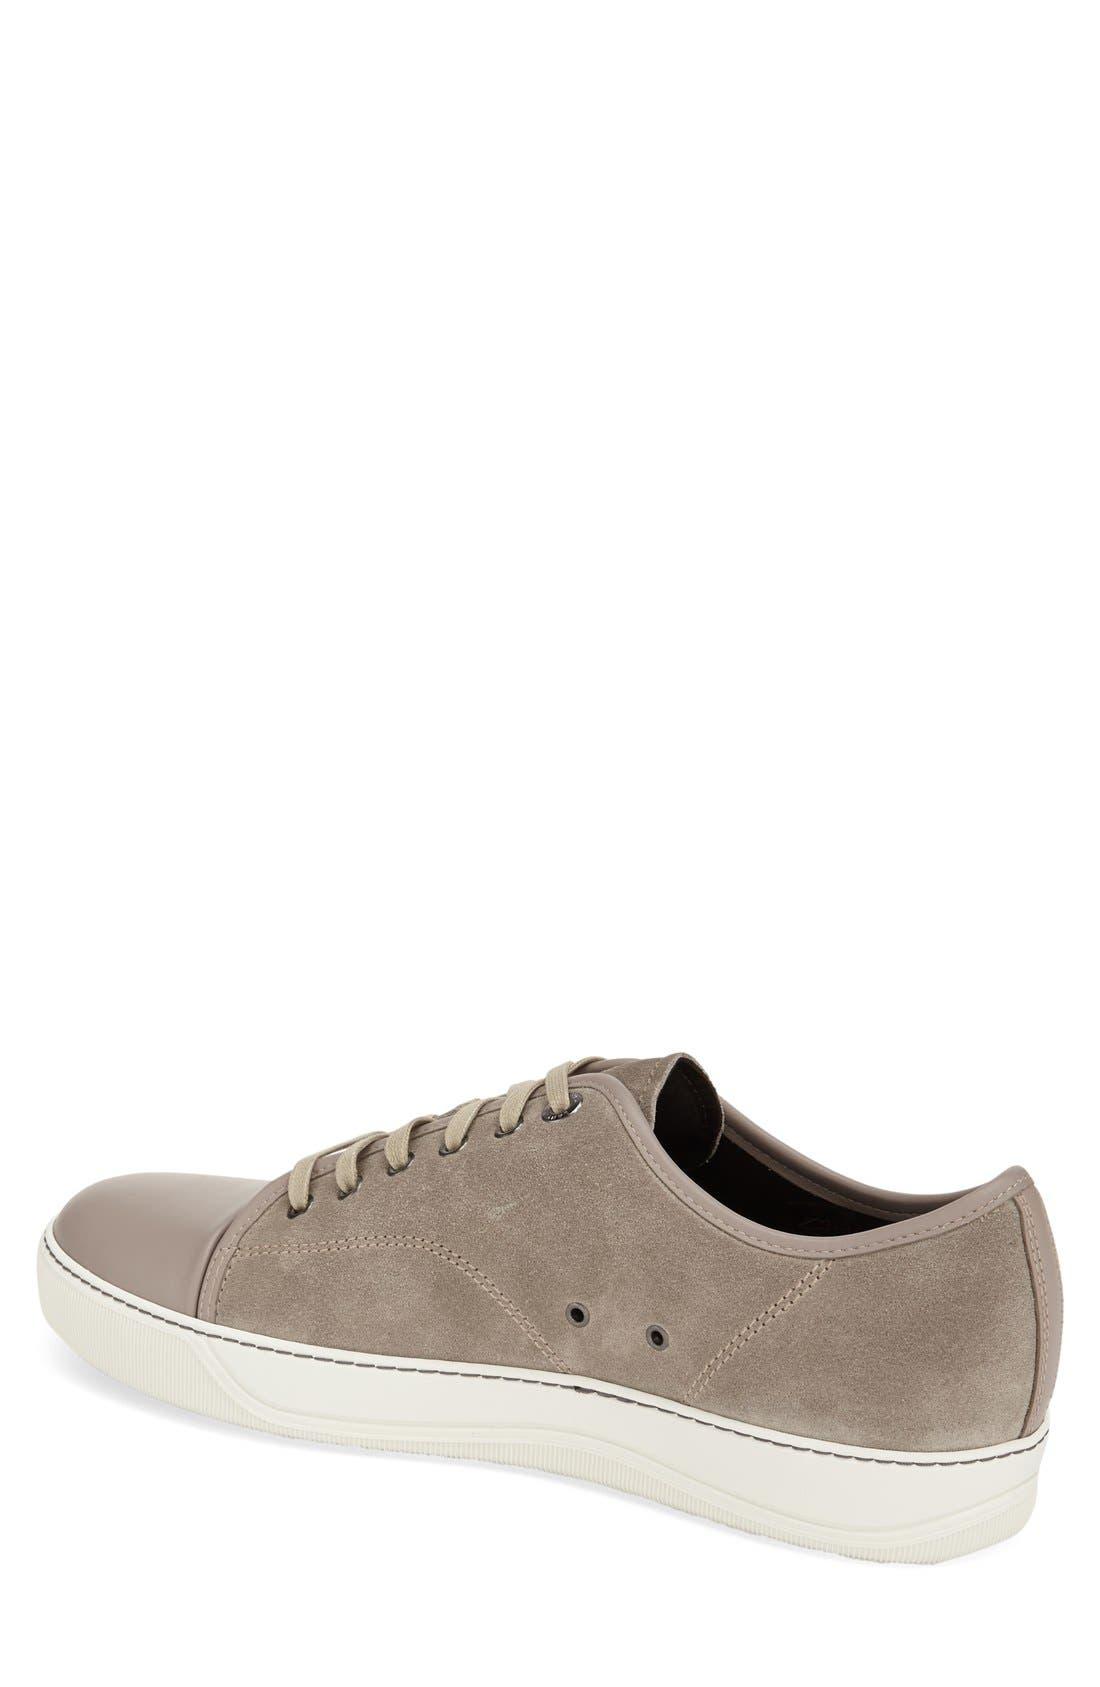 Low Top Sneaker,                             Alternate thumbnail 2, color,                             BEIGE SUEDE